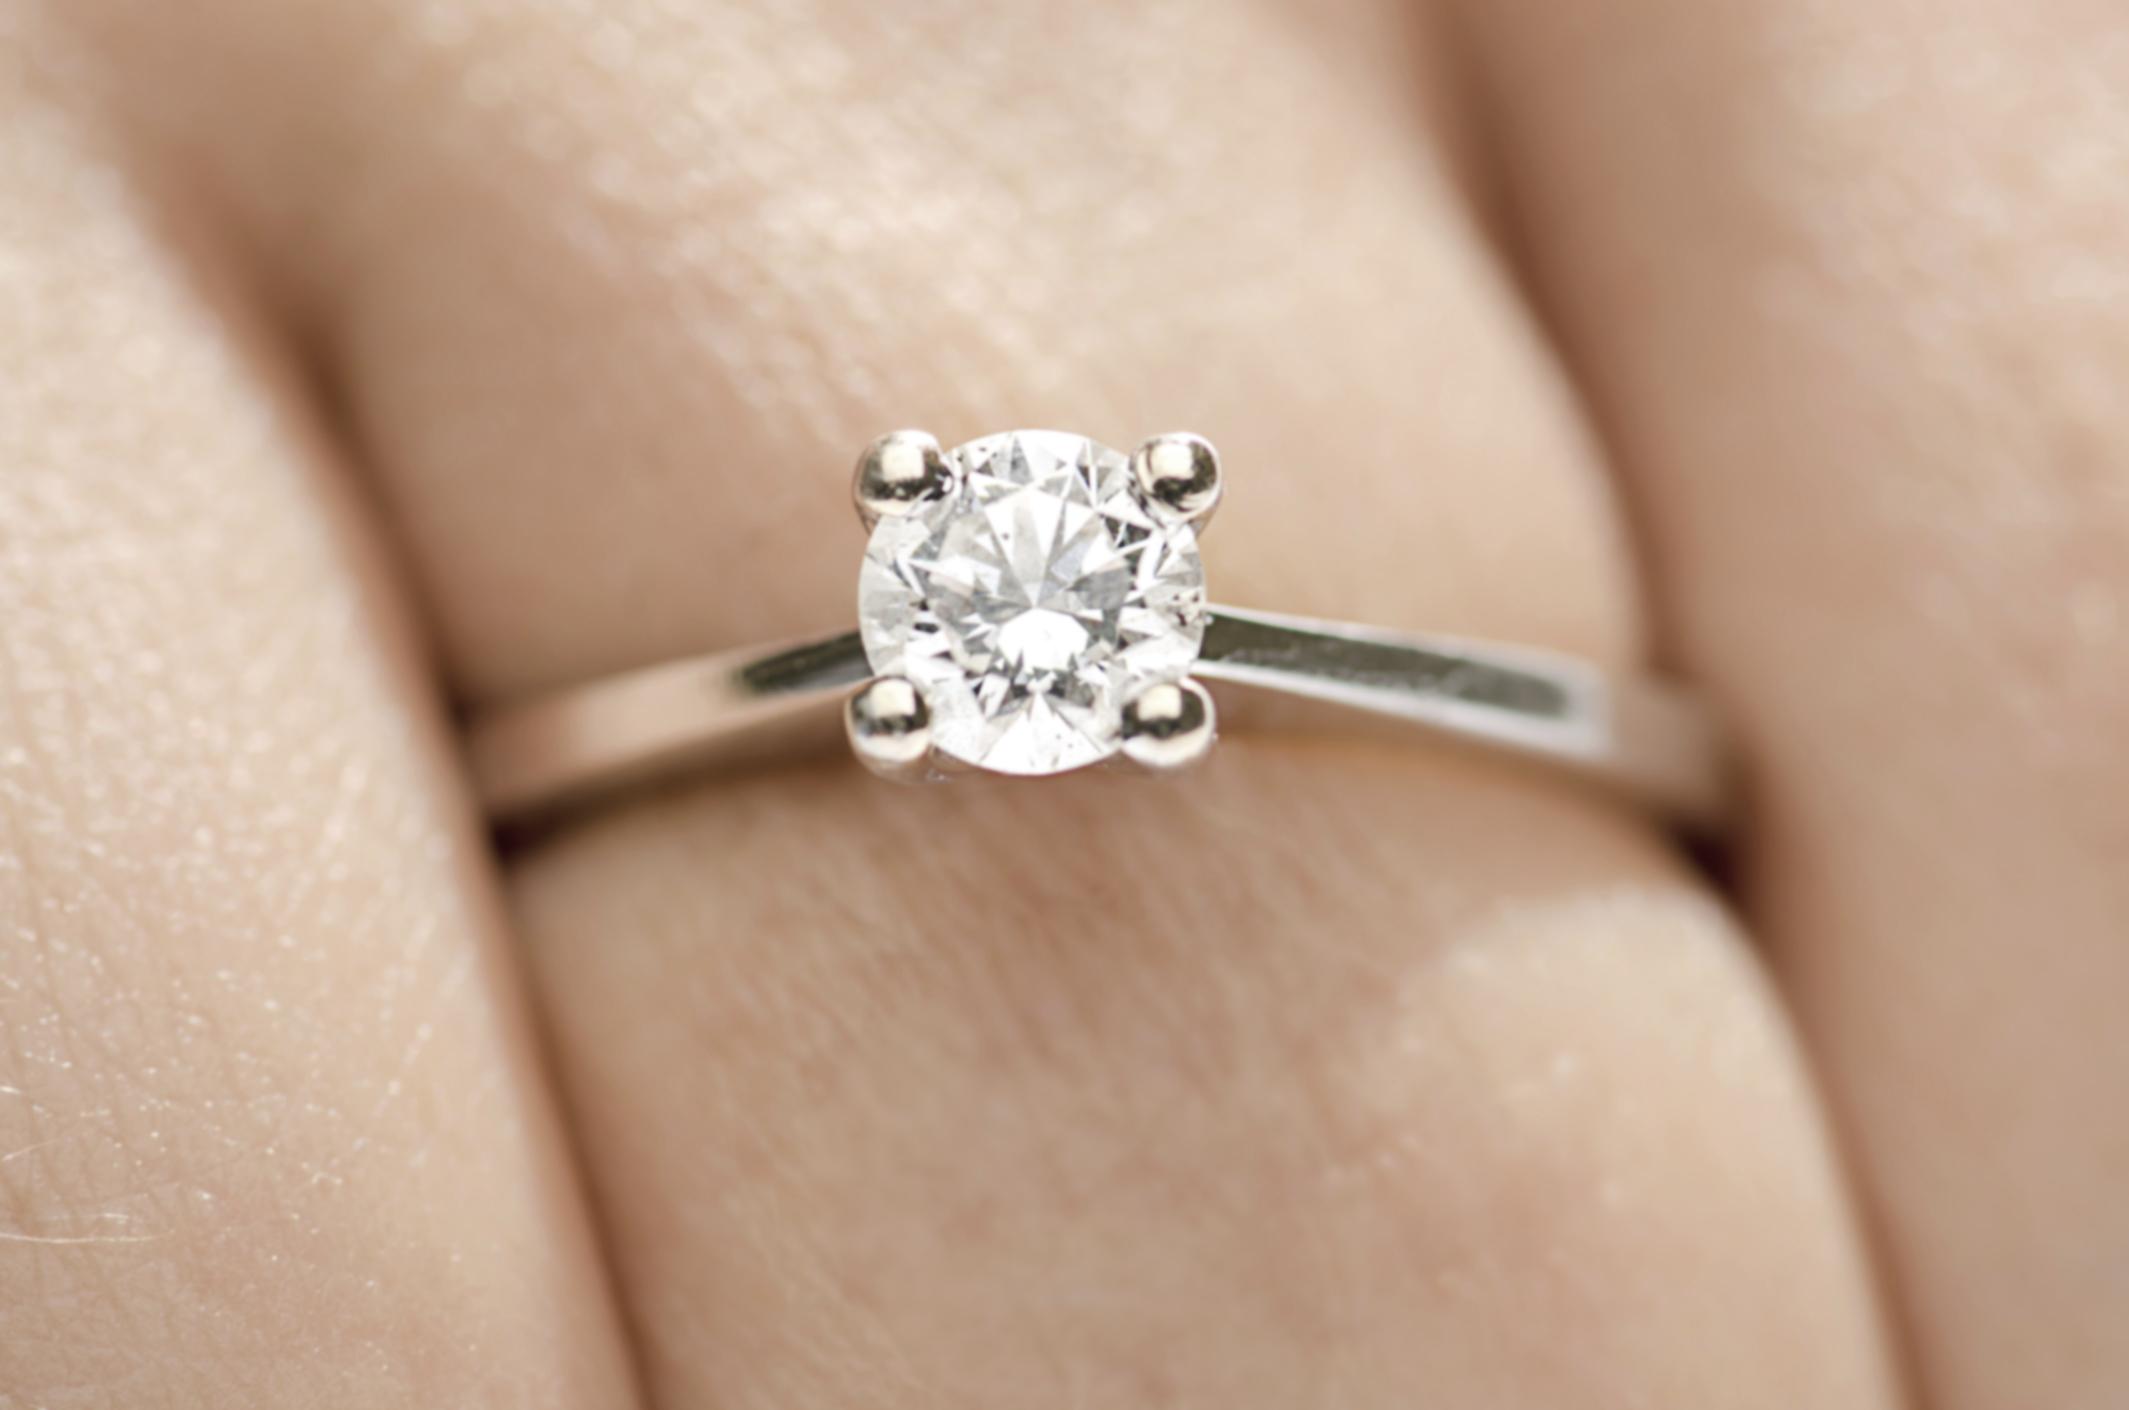 Allergic Reaction To Platinum On The Ring Finger